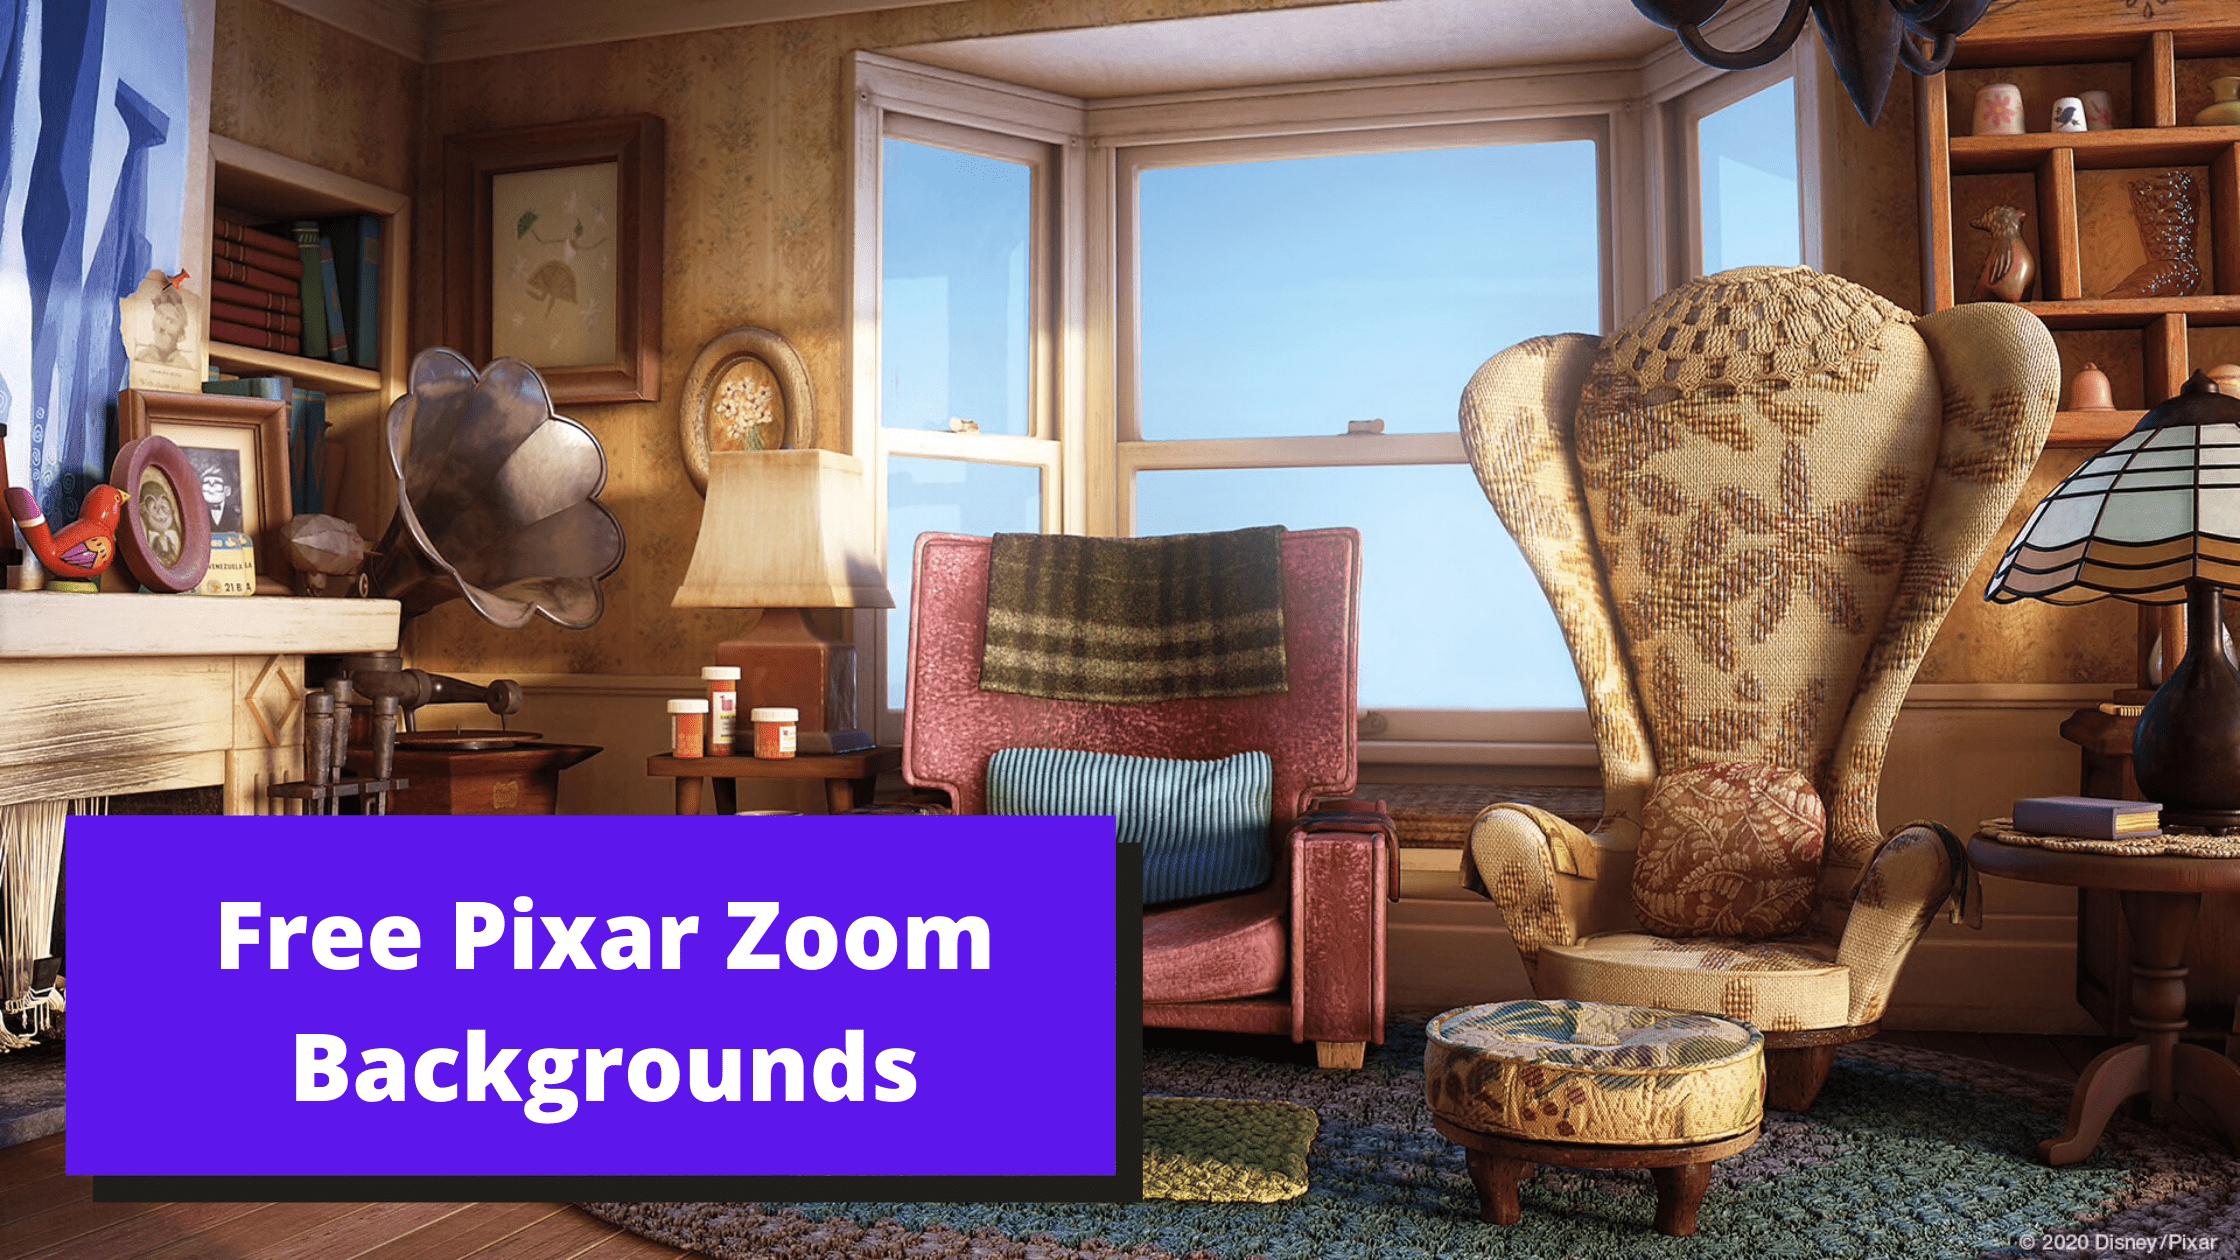 Free Pixar Zoom Backgrounds